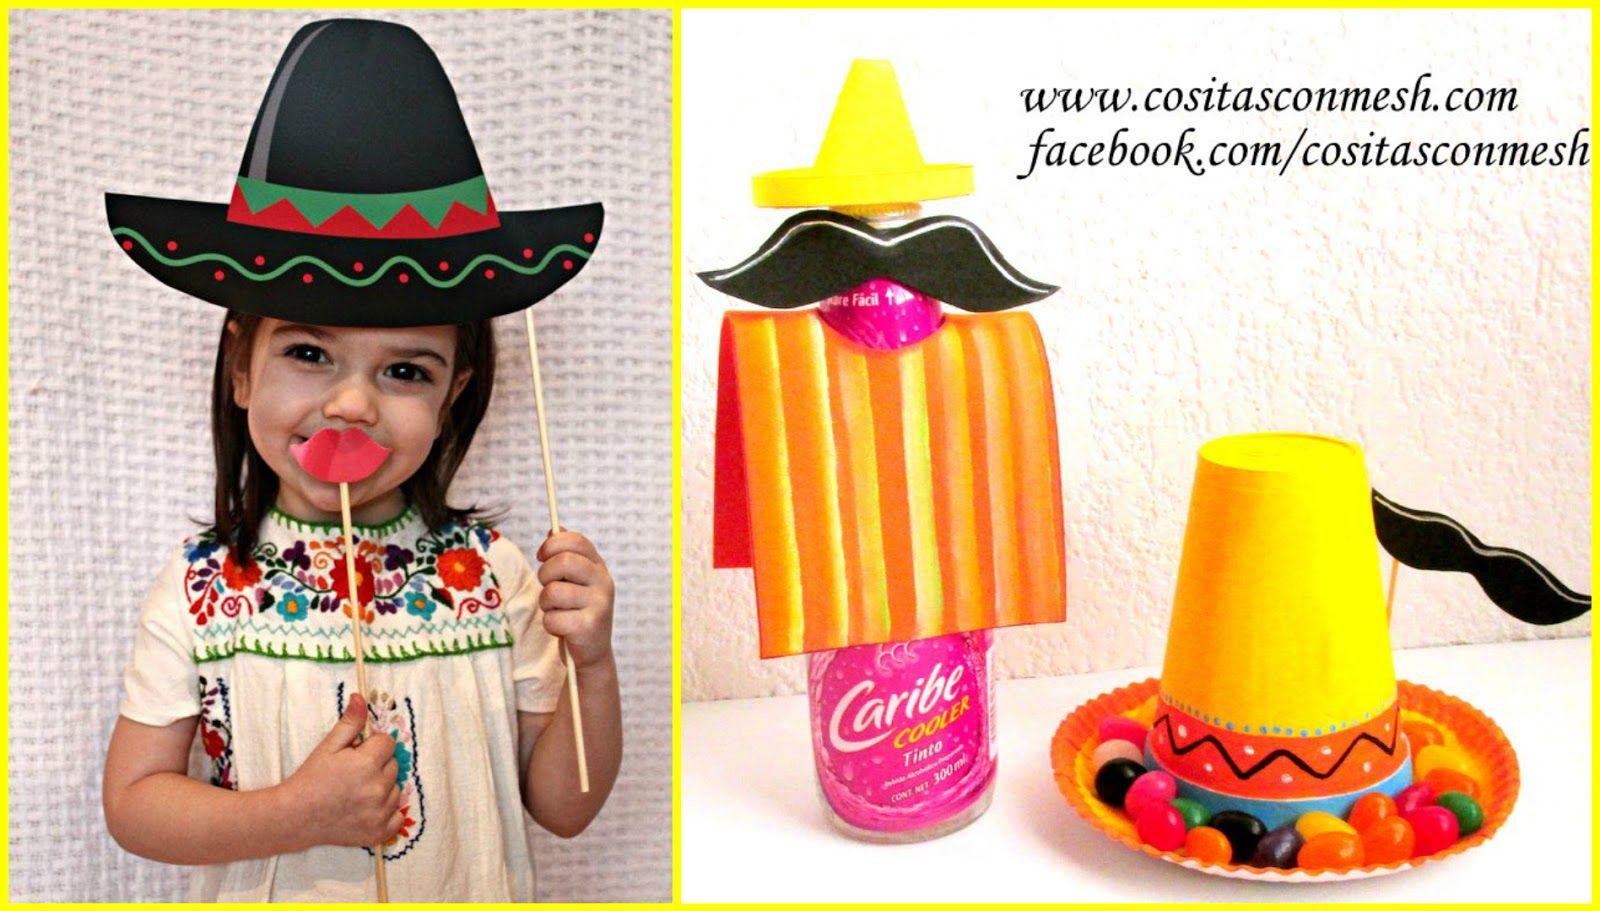 como hacer un sombrero mexicano paso a paso - Buscar con Google  83c366888ff